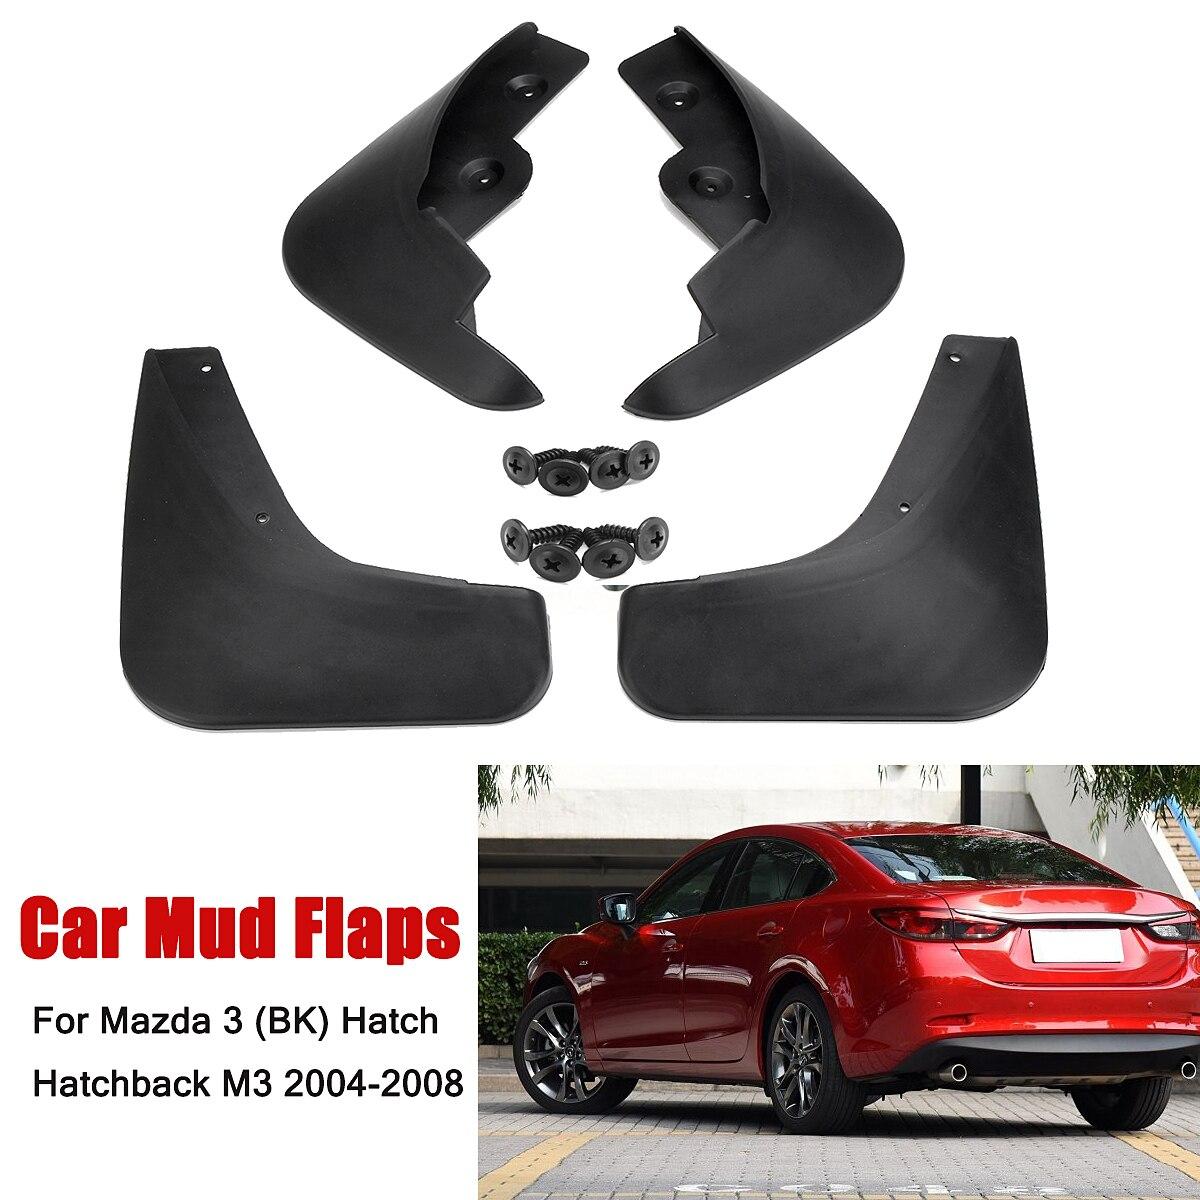 2008 Mazda 3 For Sale 1 6m Obo: Aliexpress.com : Buy For Mazda 3 (BK) Hatch Hatchback M3 2004 2008 Car Mud Flaps Front Rear